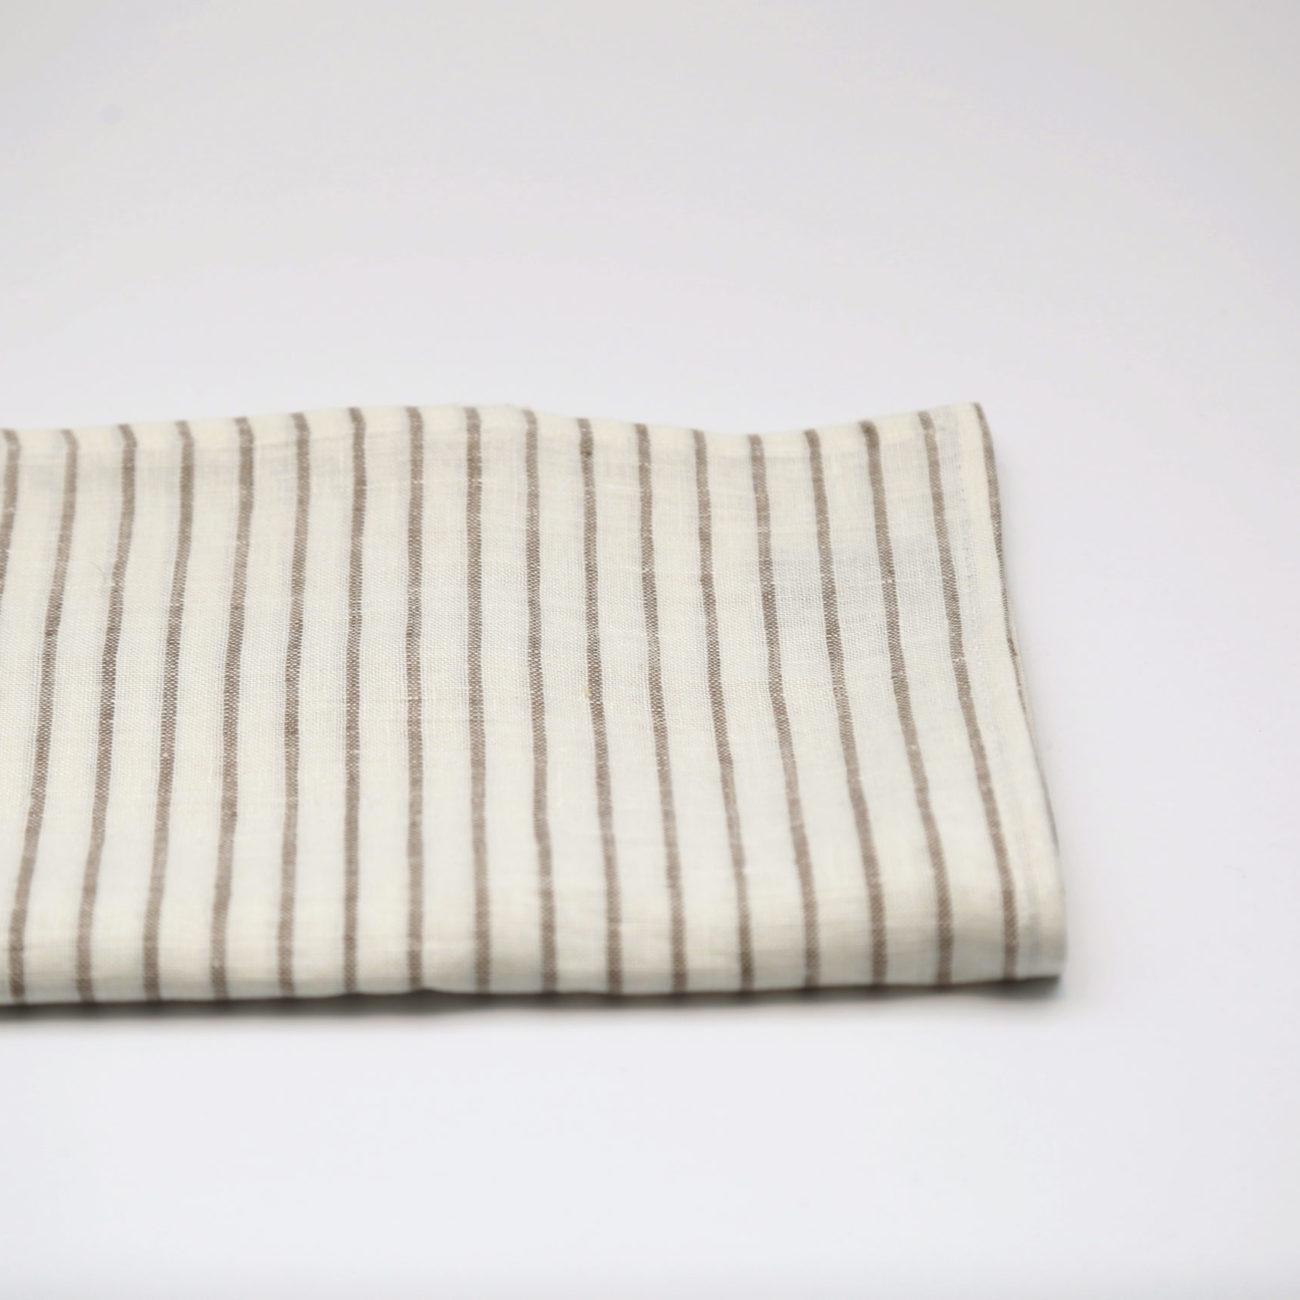 Arman Tea Towels Ivory with Taupe Stripes